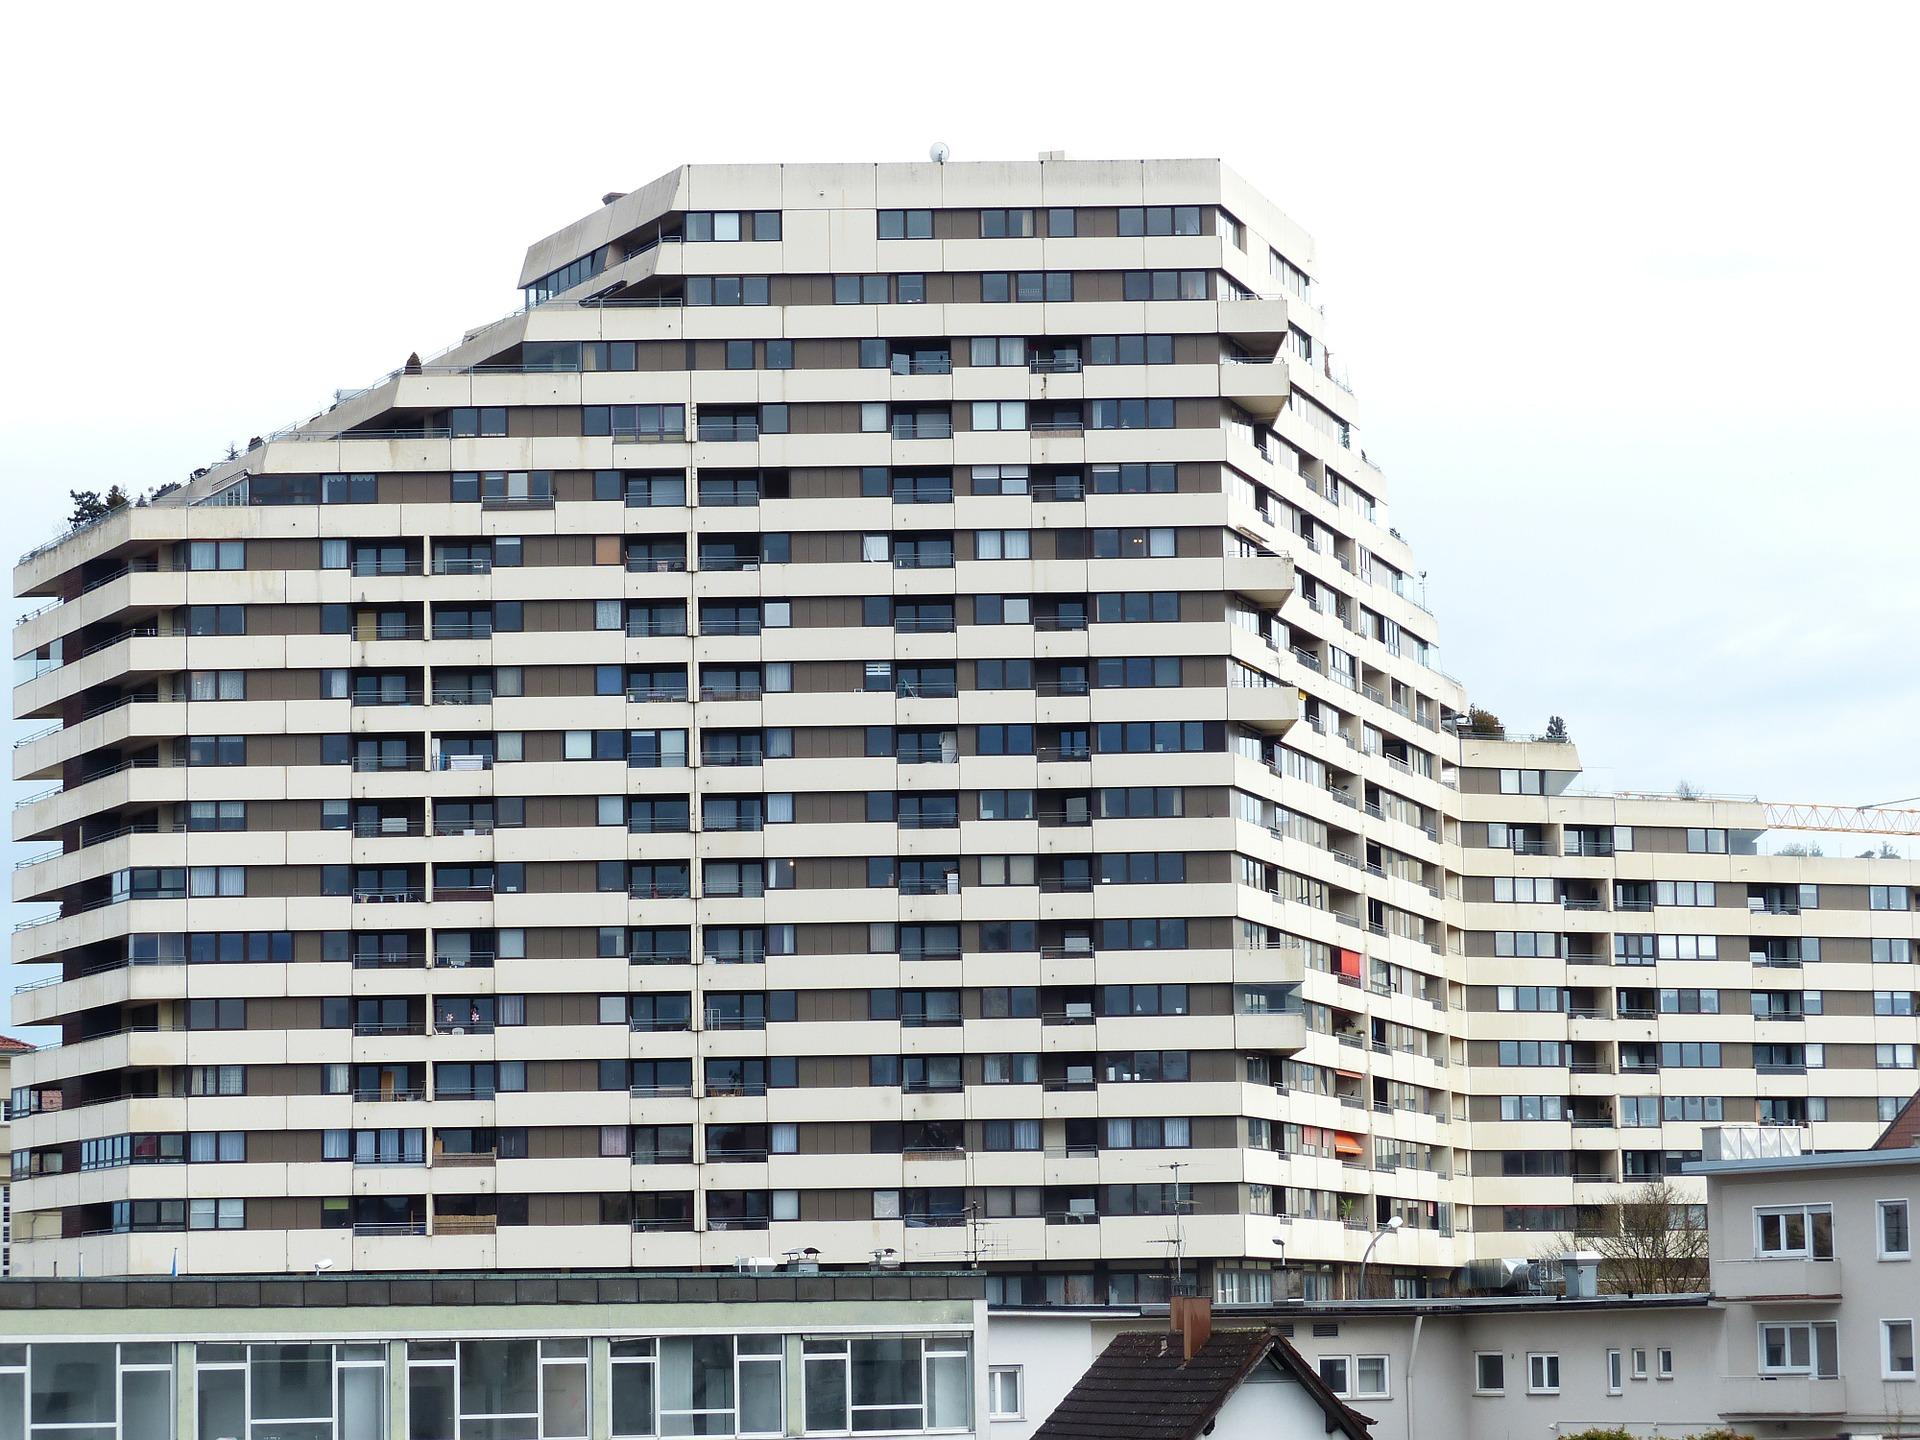 Bloque de viviendas / Pixabay